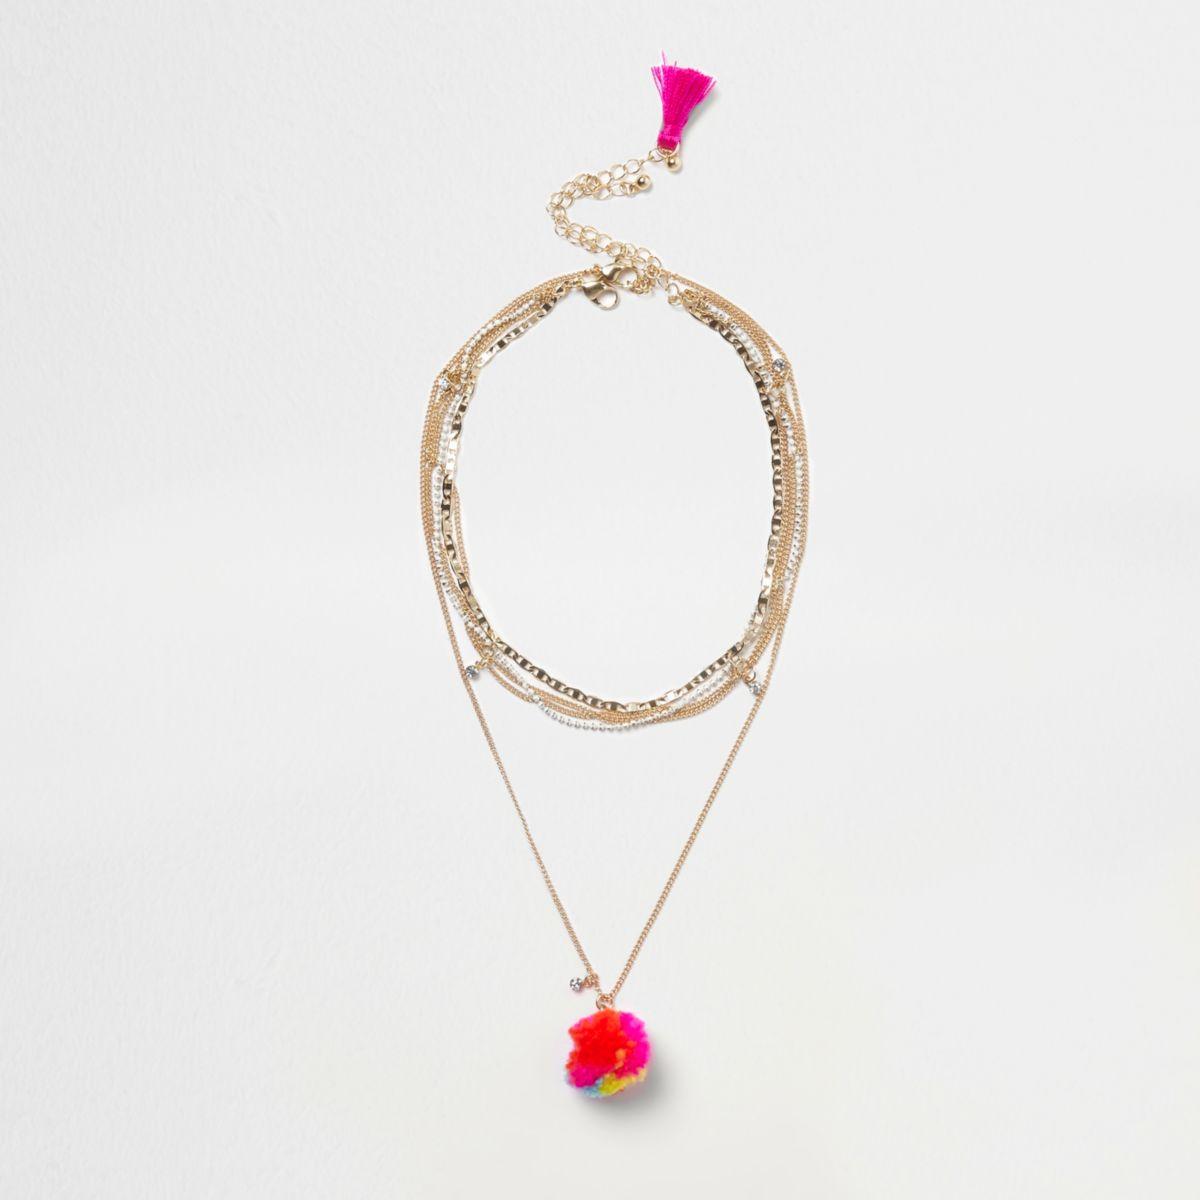 Gold tone tassel pom pom necklace